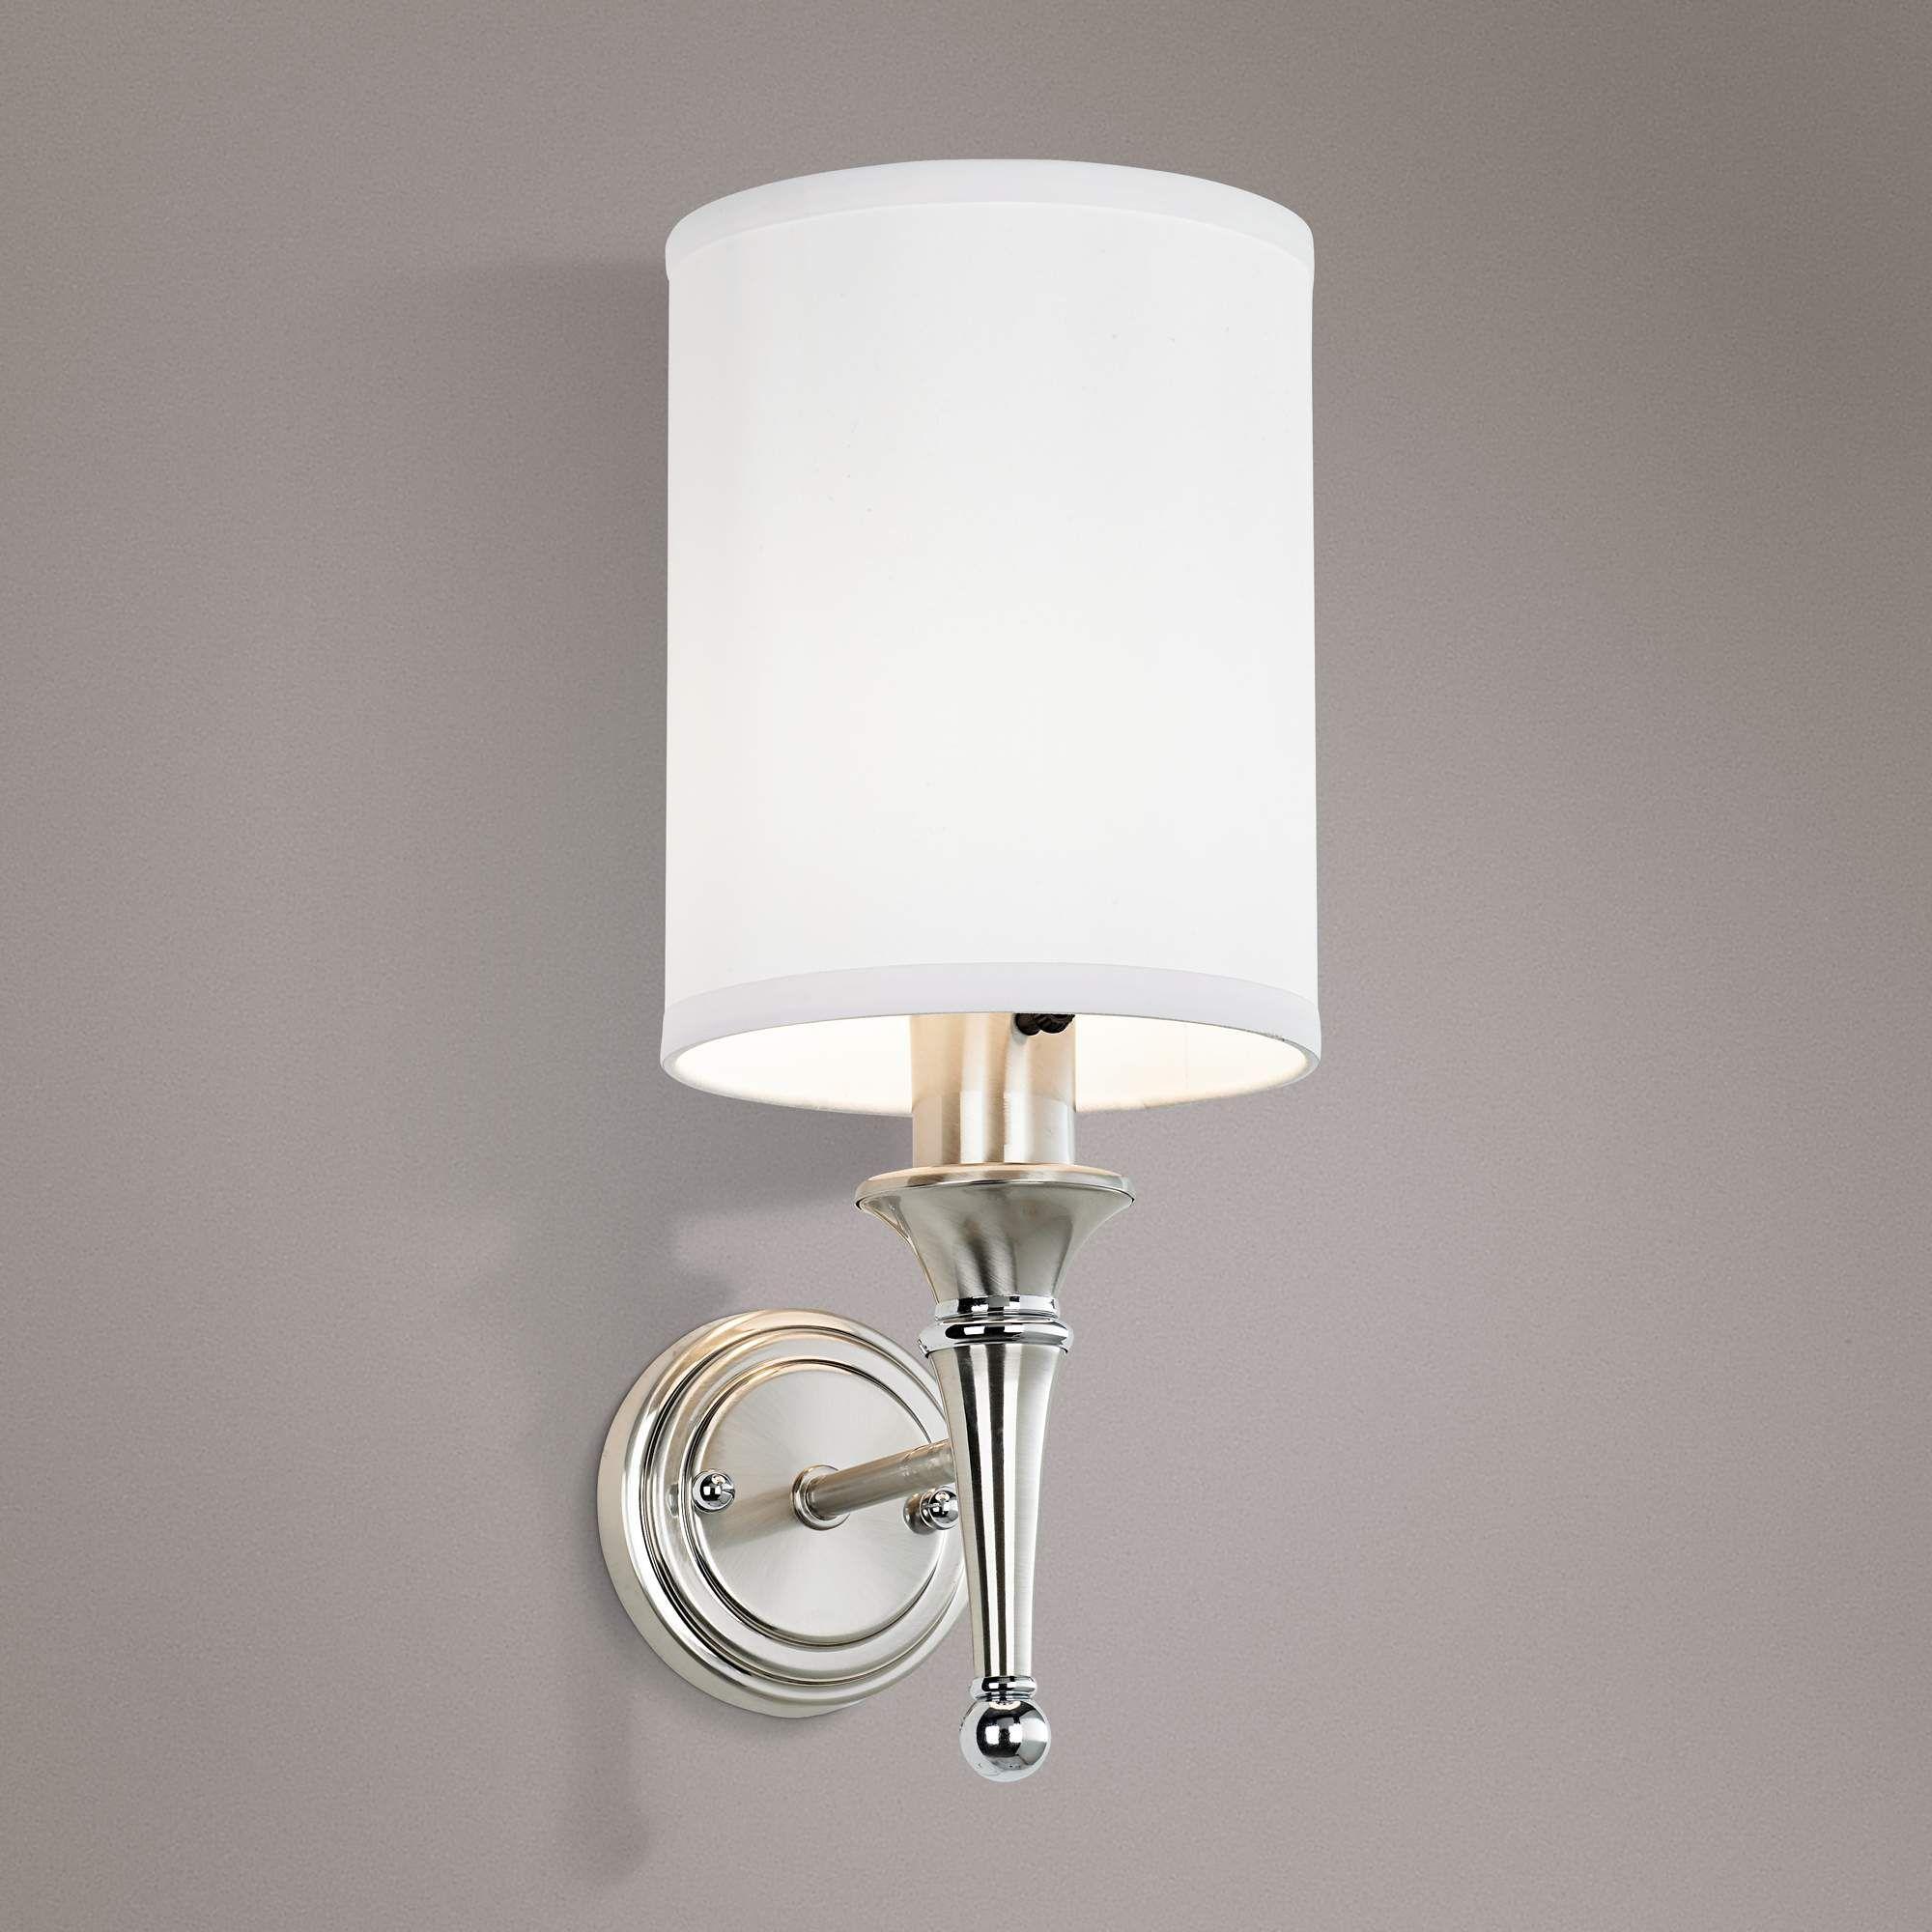 Braidy Brushed Nickel Plug In Wall Sconce 58058 Lamps Plus Plug In Wall Sconce Sconces Wall Mounted Lamps